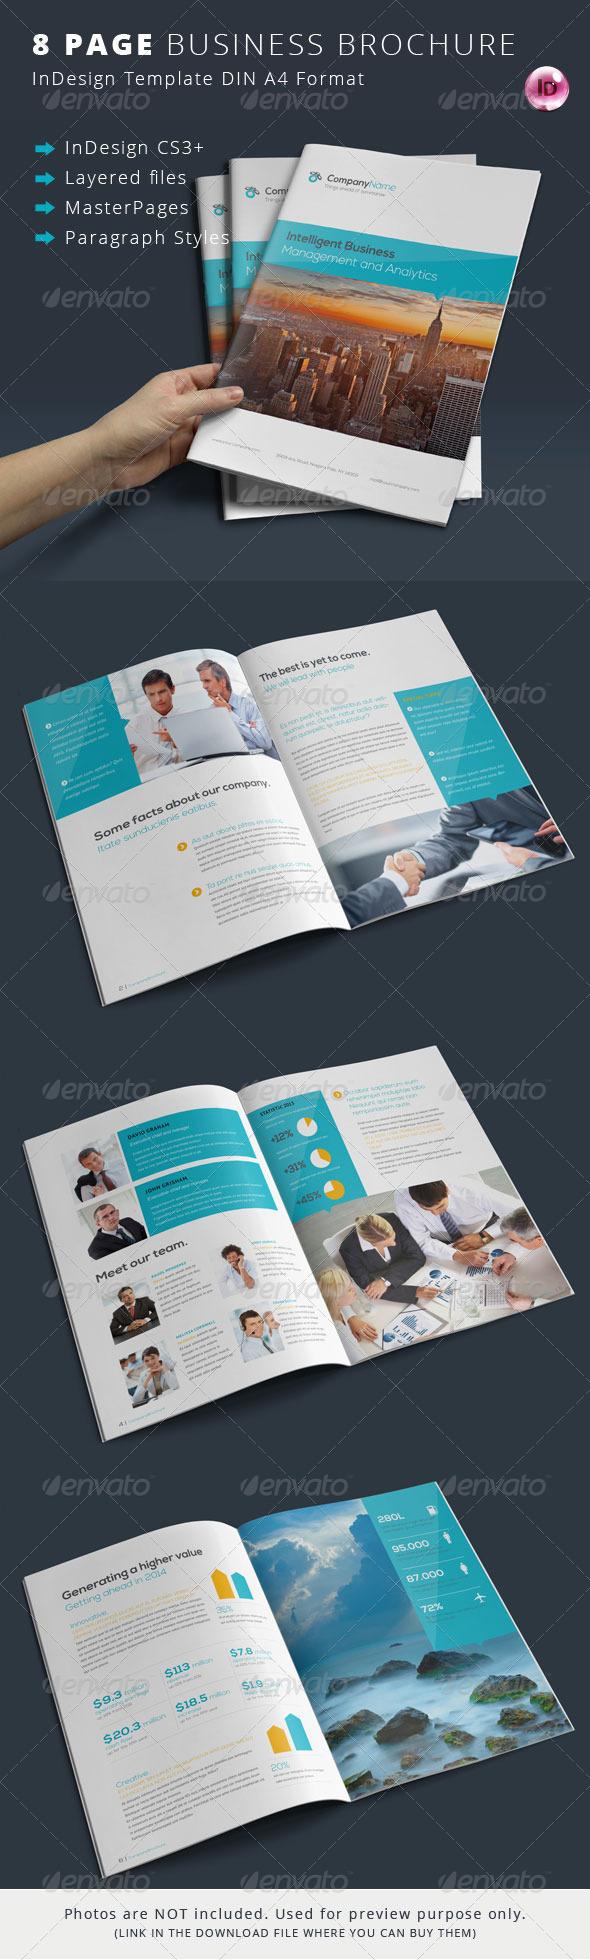 GraphicRiver 8 Page Corporate Brochure 7311050